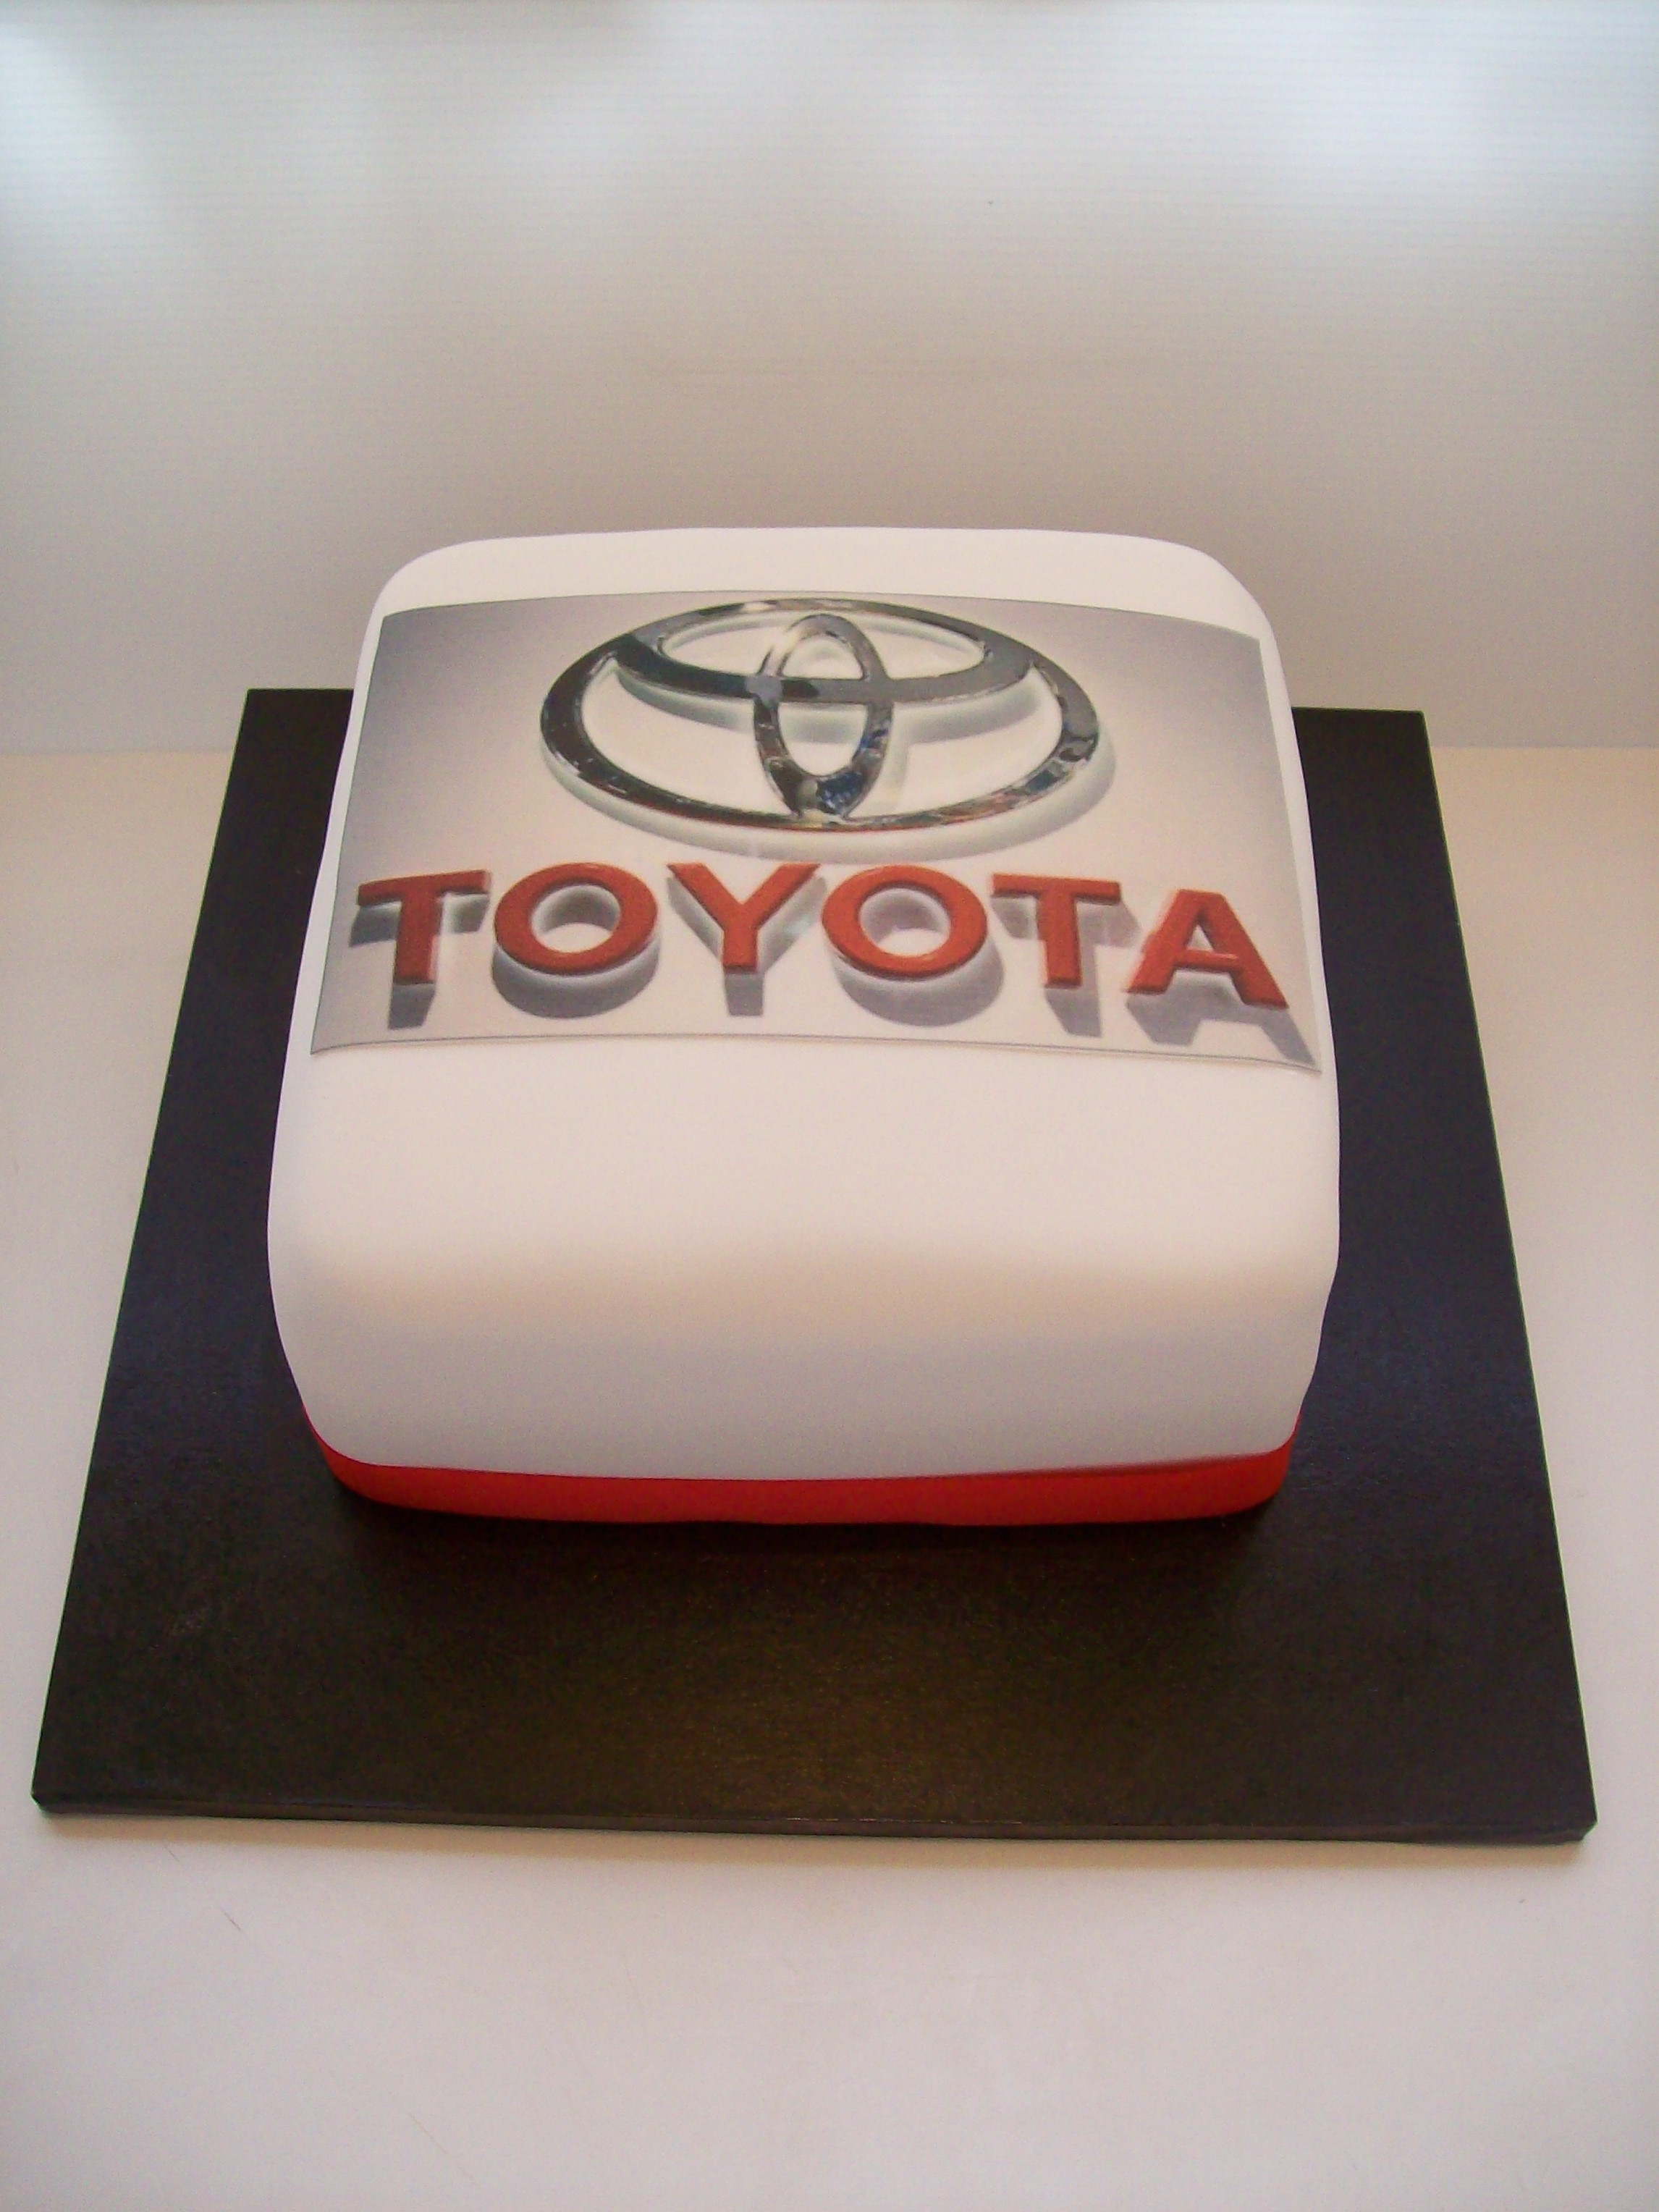 Toyota Cake 129 Temptation Cakes Temptation Cakes